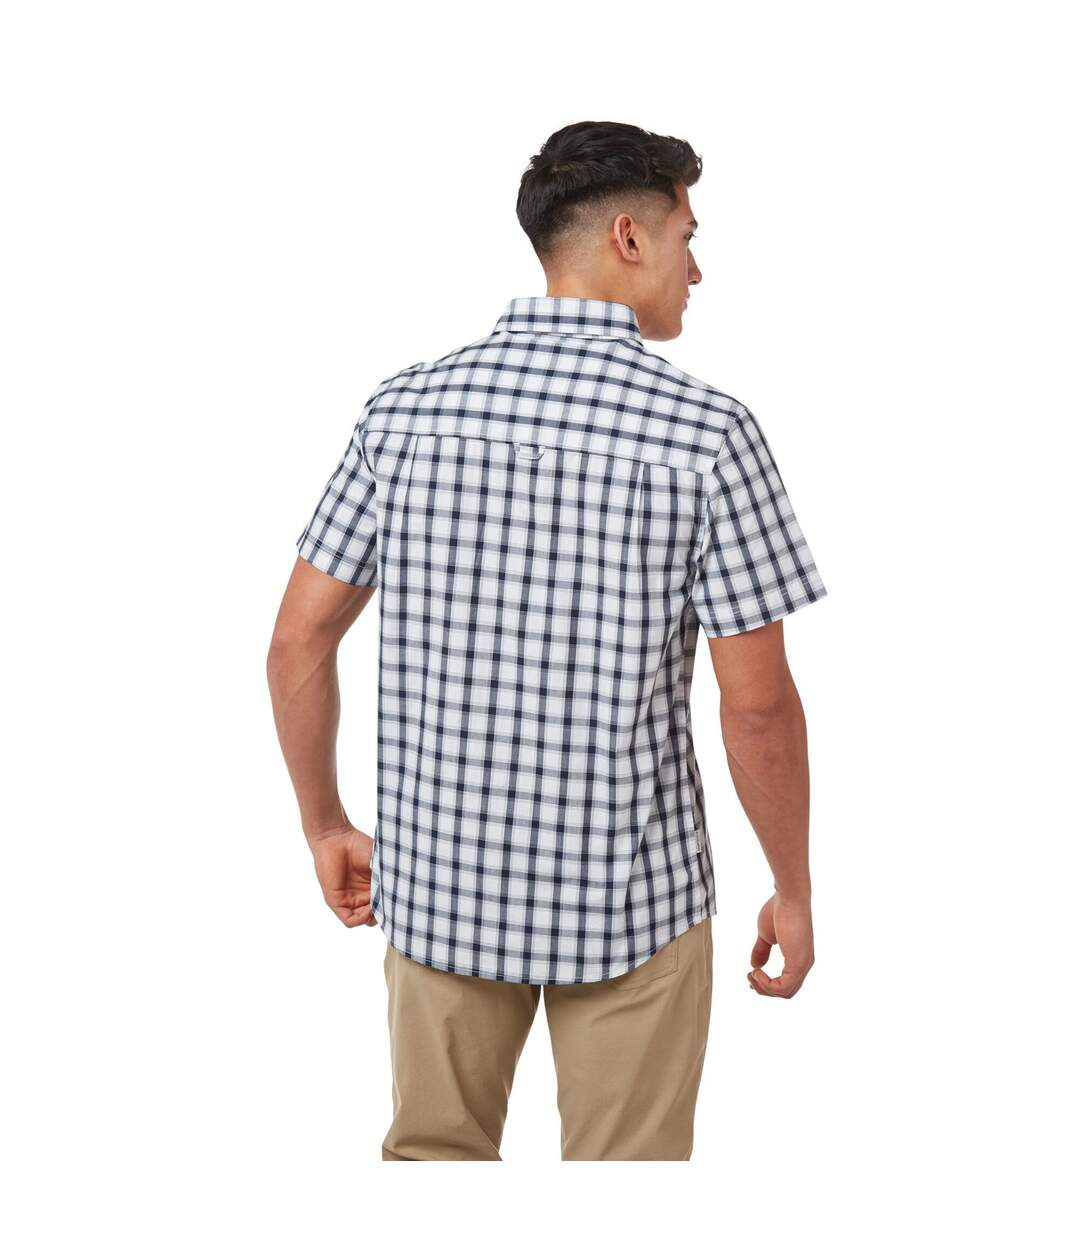 Craghoppers Mens Passos Short-Sleeved Shirt (Navy) - UTCG1484